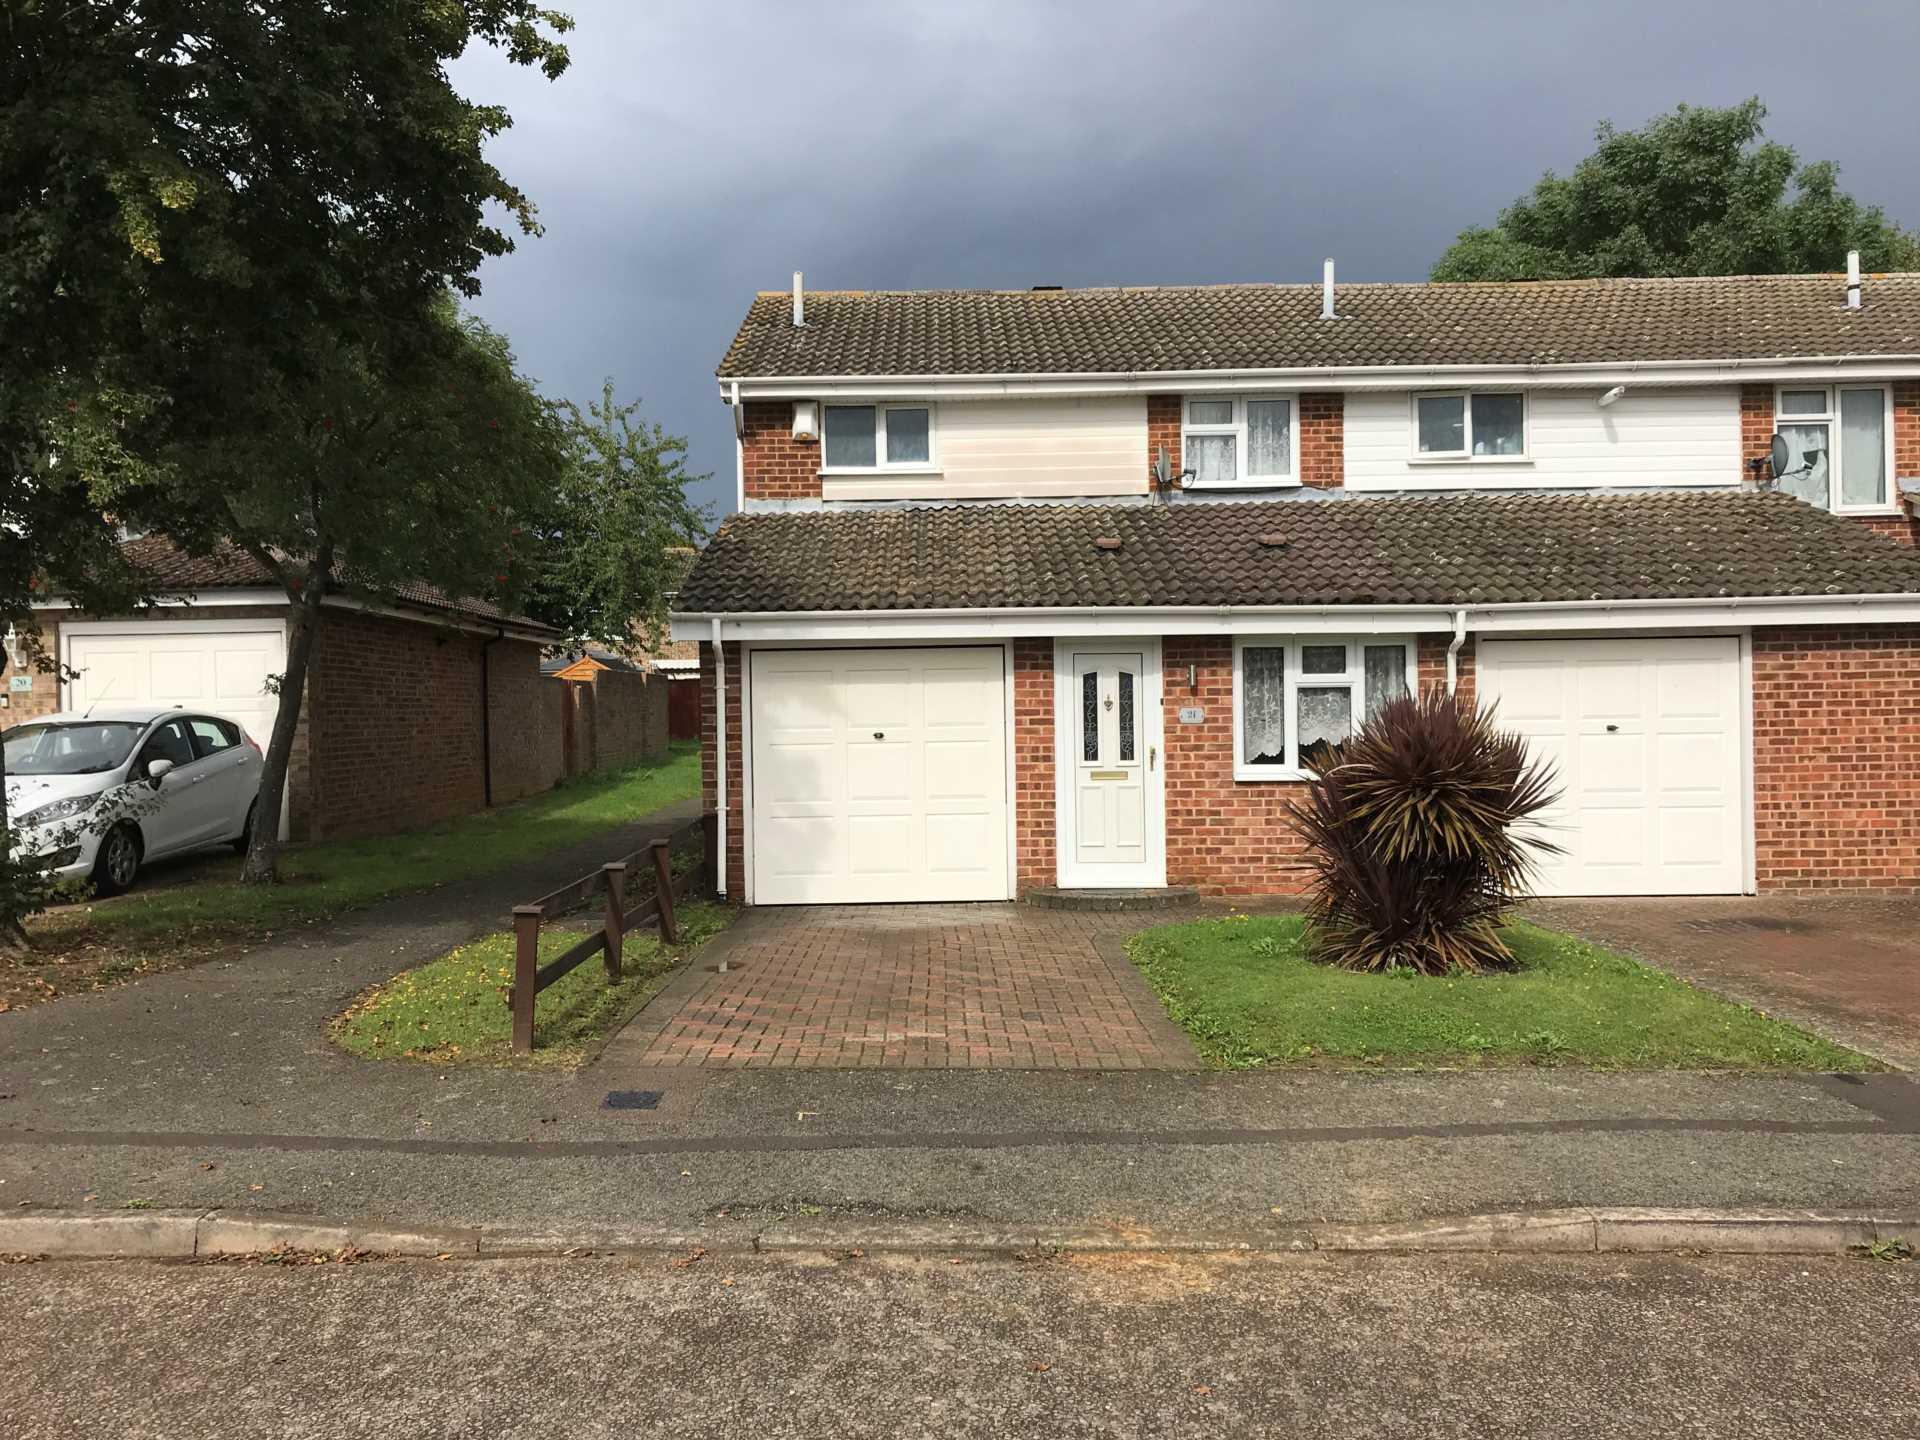 Haddington Close, Bletchley, Image 1